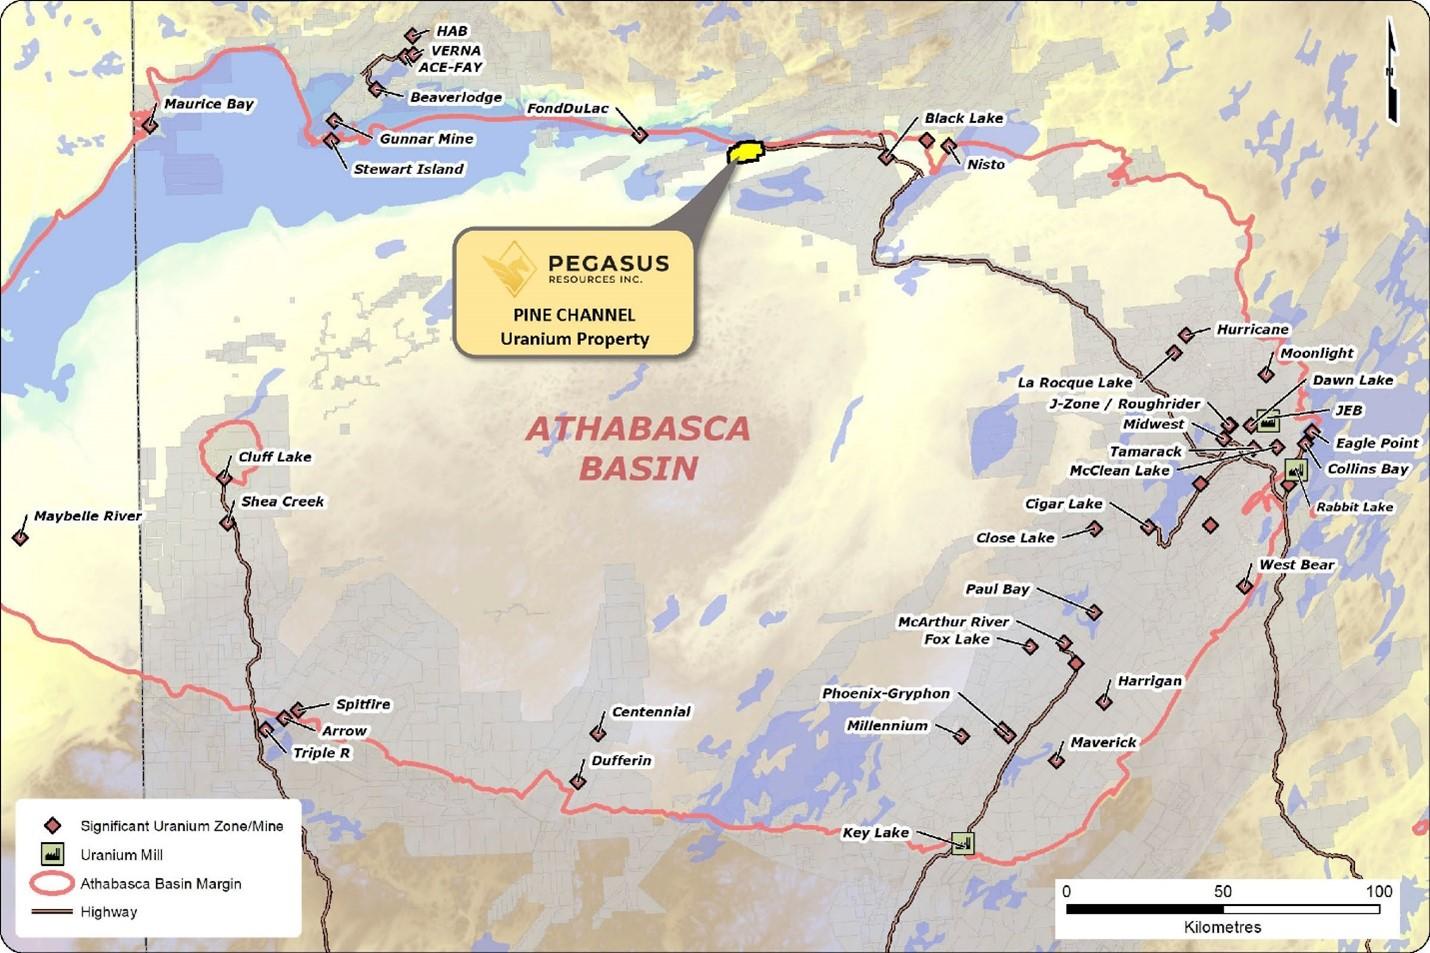 Pine Channel Uranium Property – Athabasca Basin